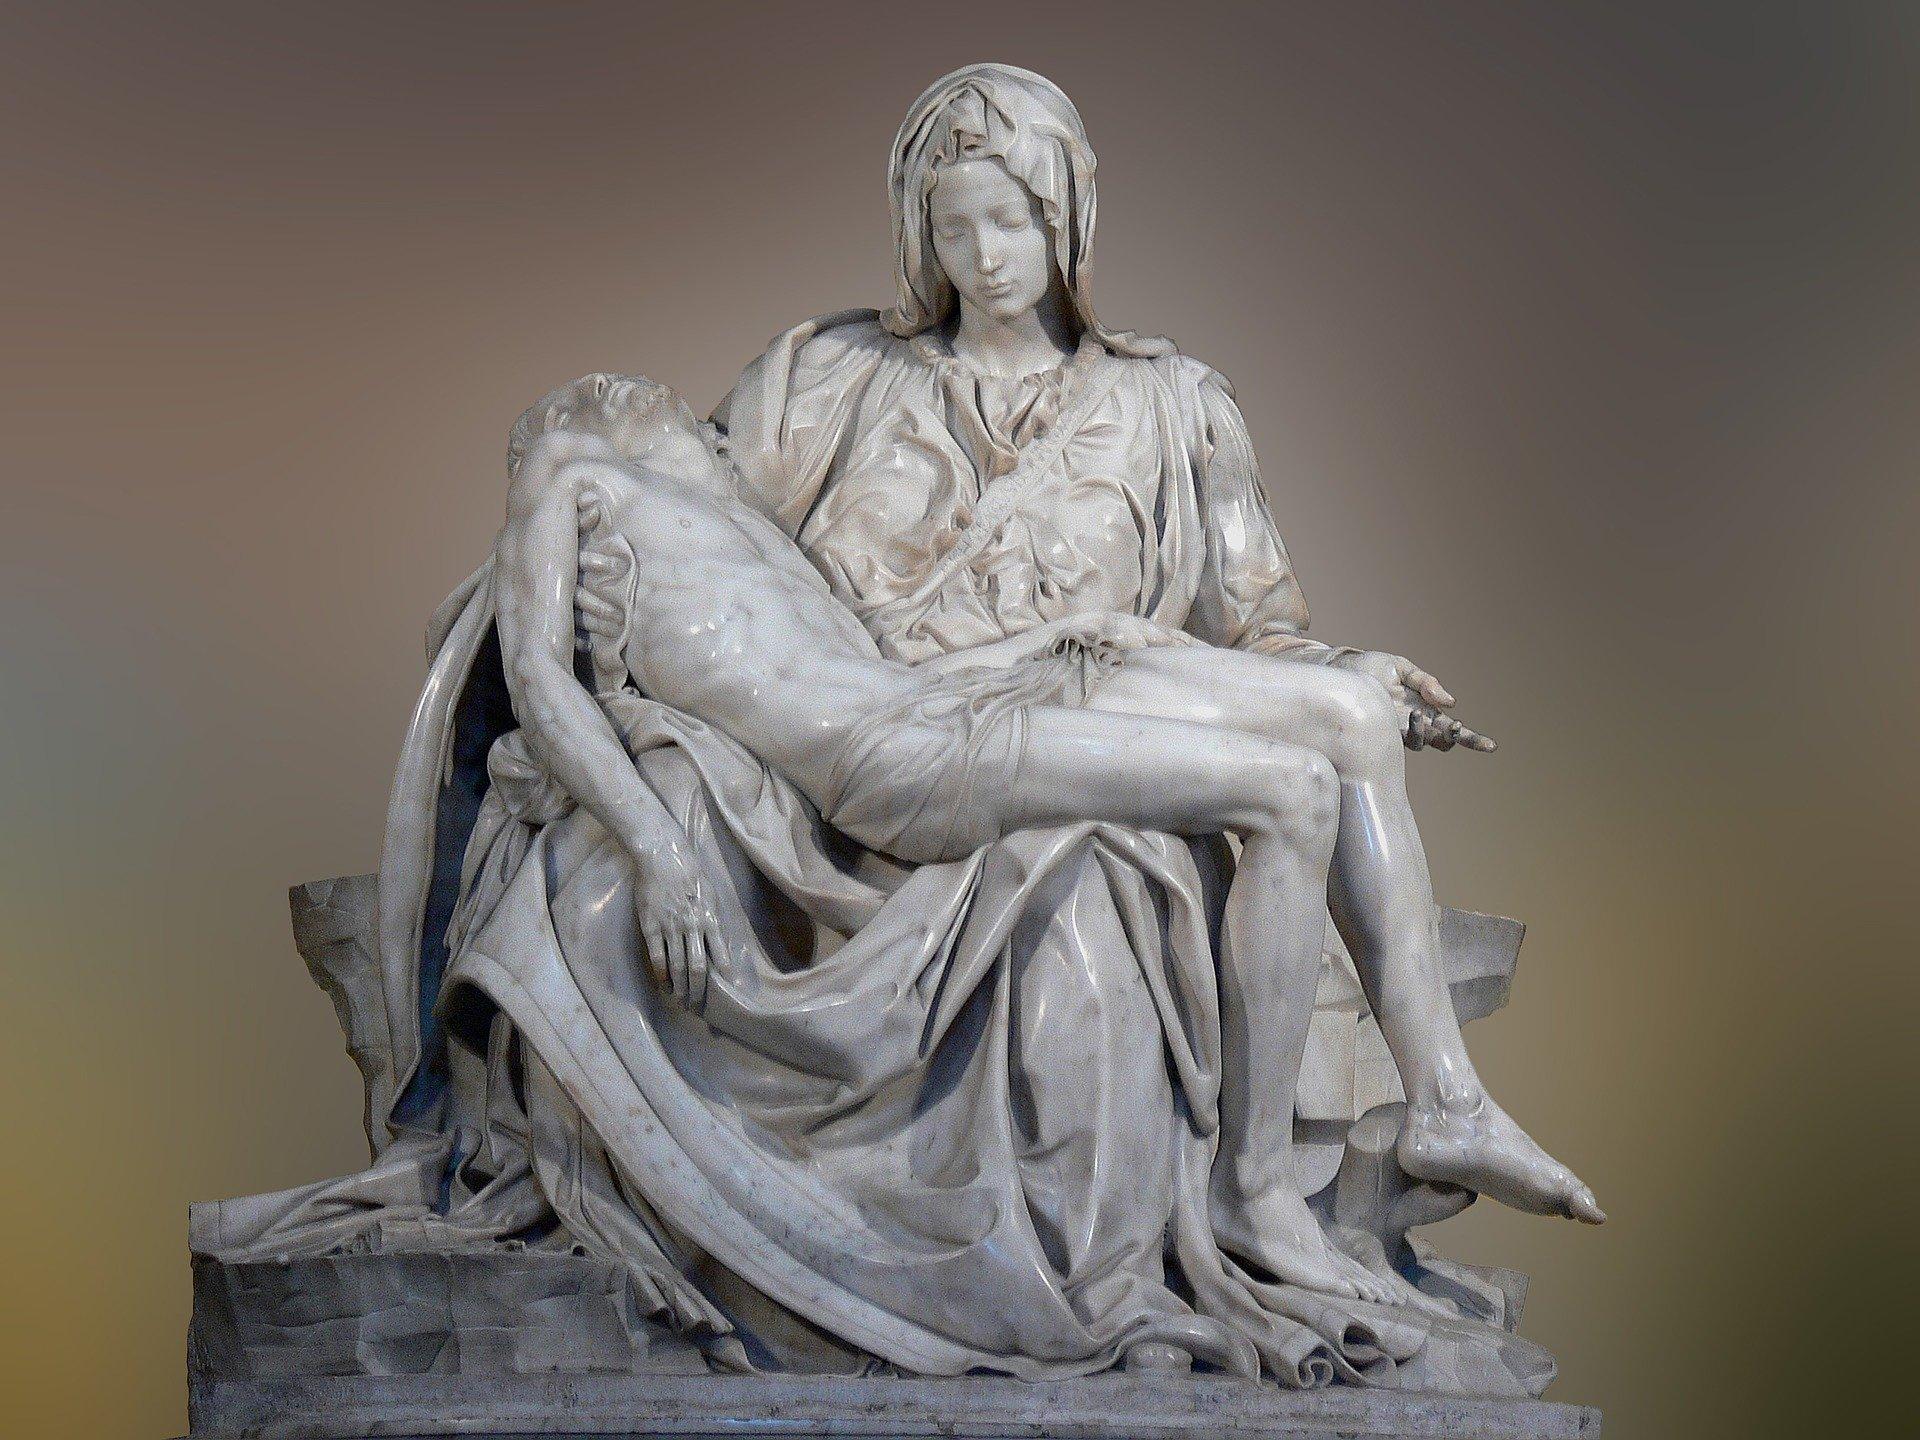 Pietra by Michelangelo, St. Peter's Basilica, Vatican City